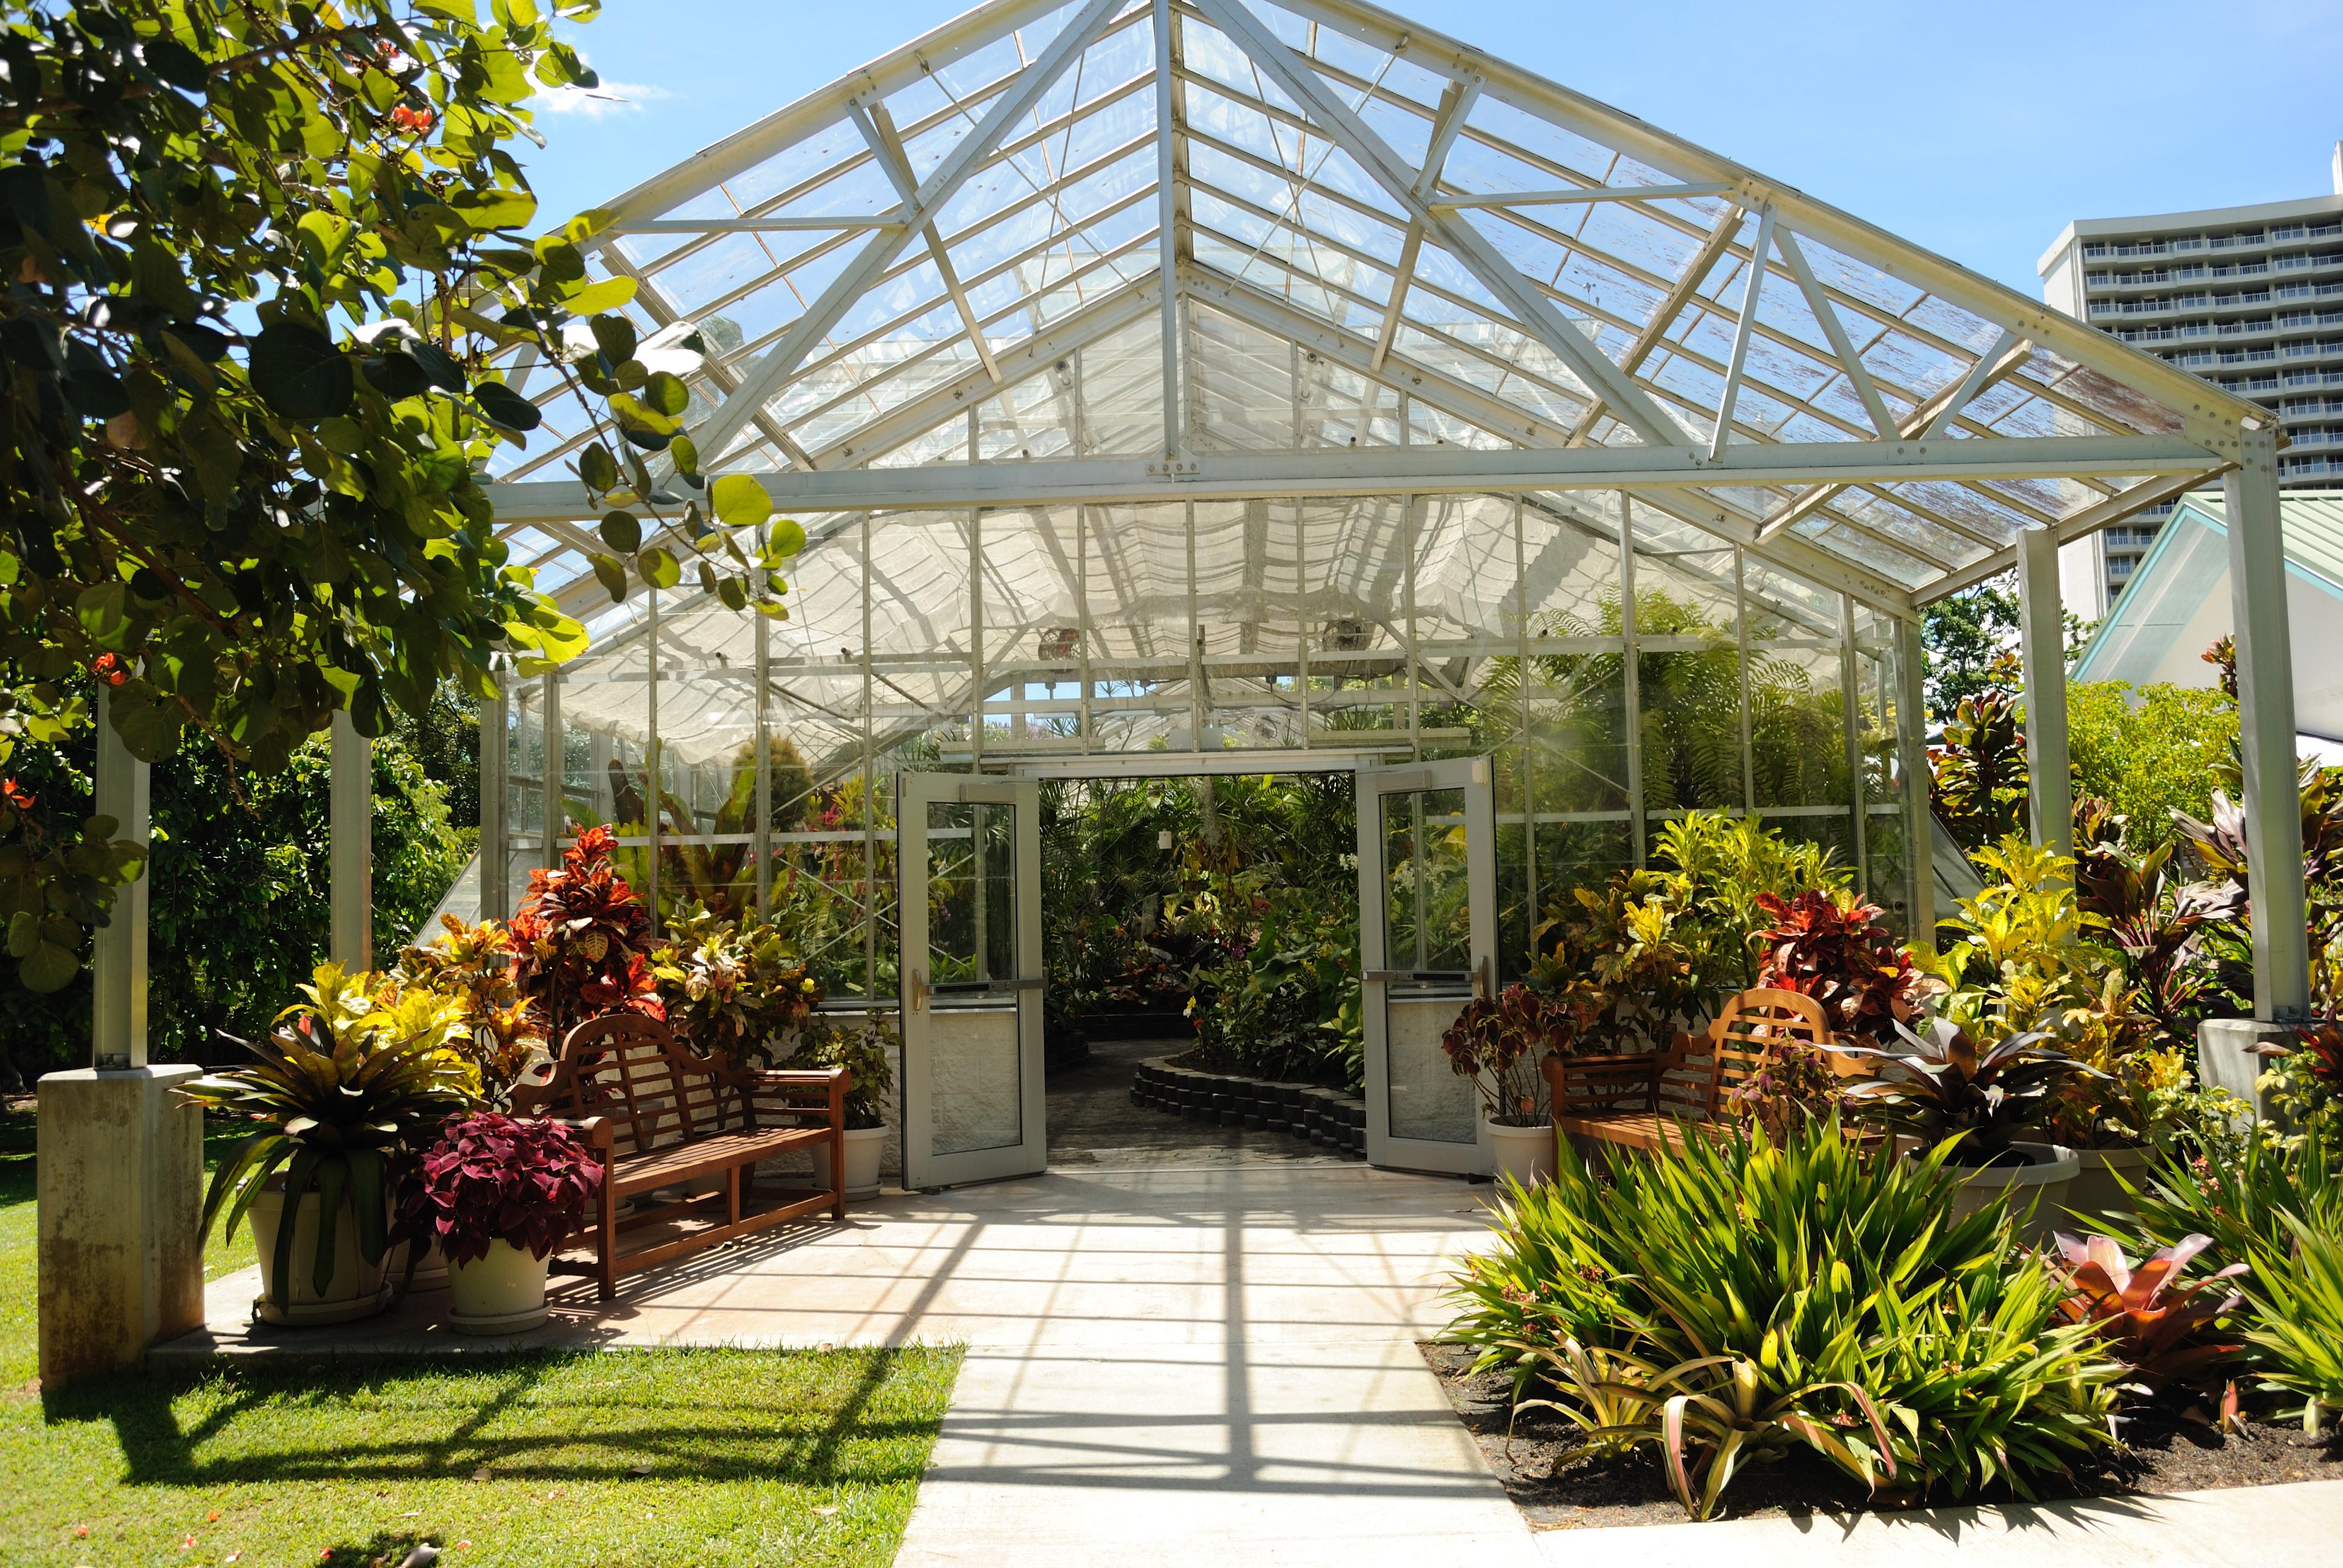 Attrayant File:Conservatory @ Foster Botanical Garden (4719366817)